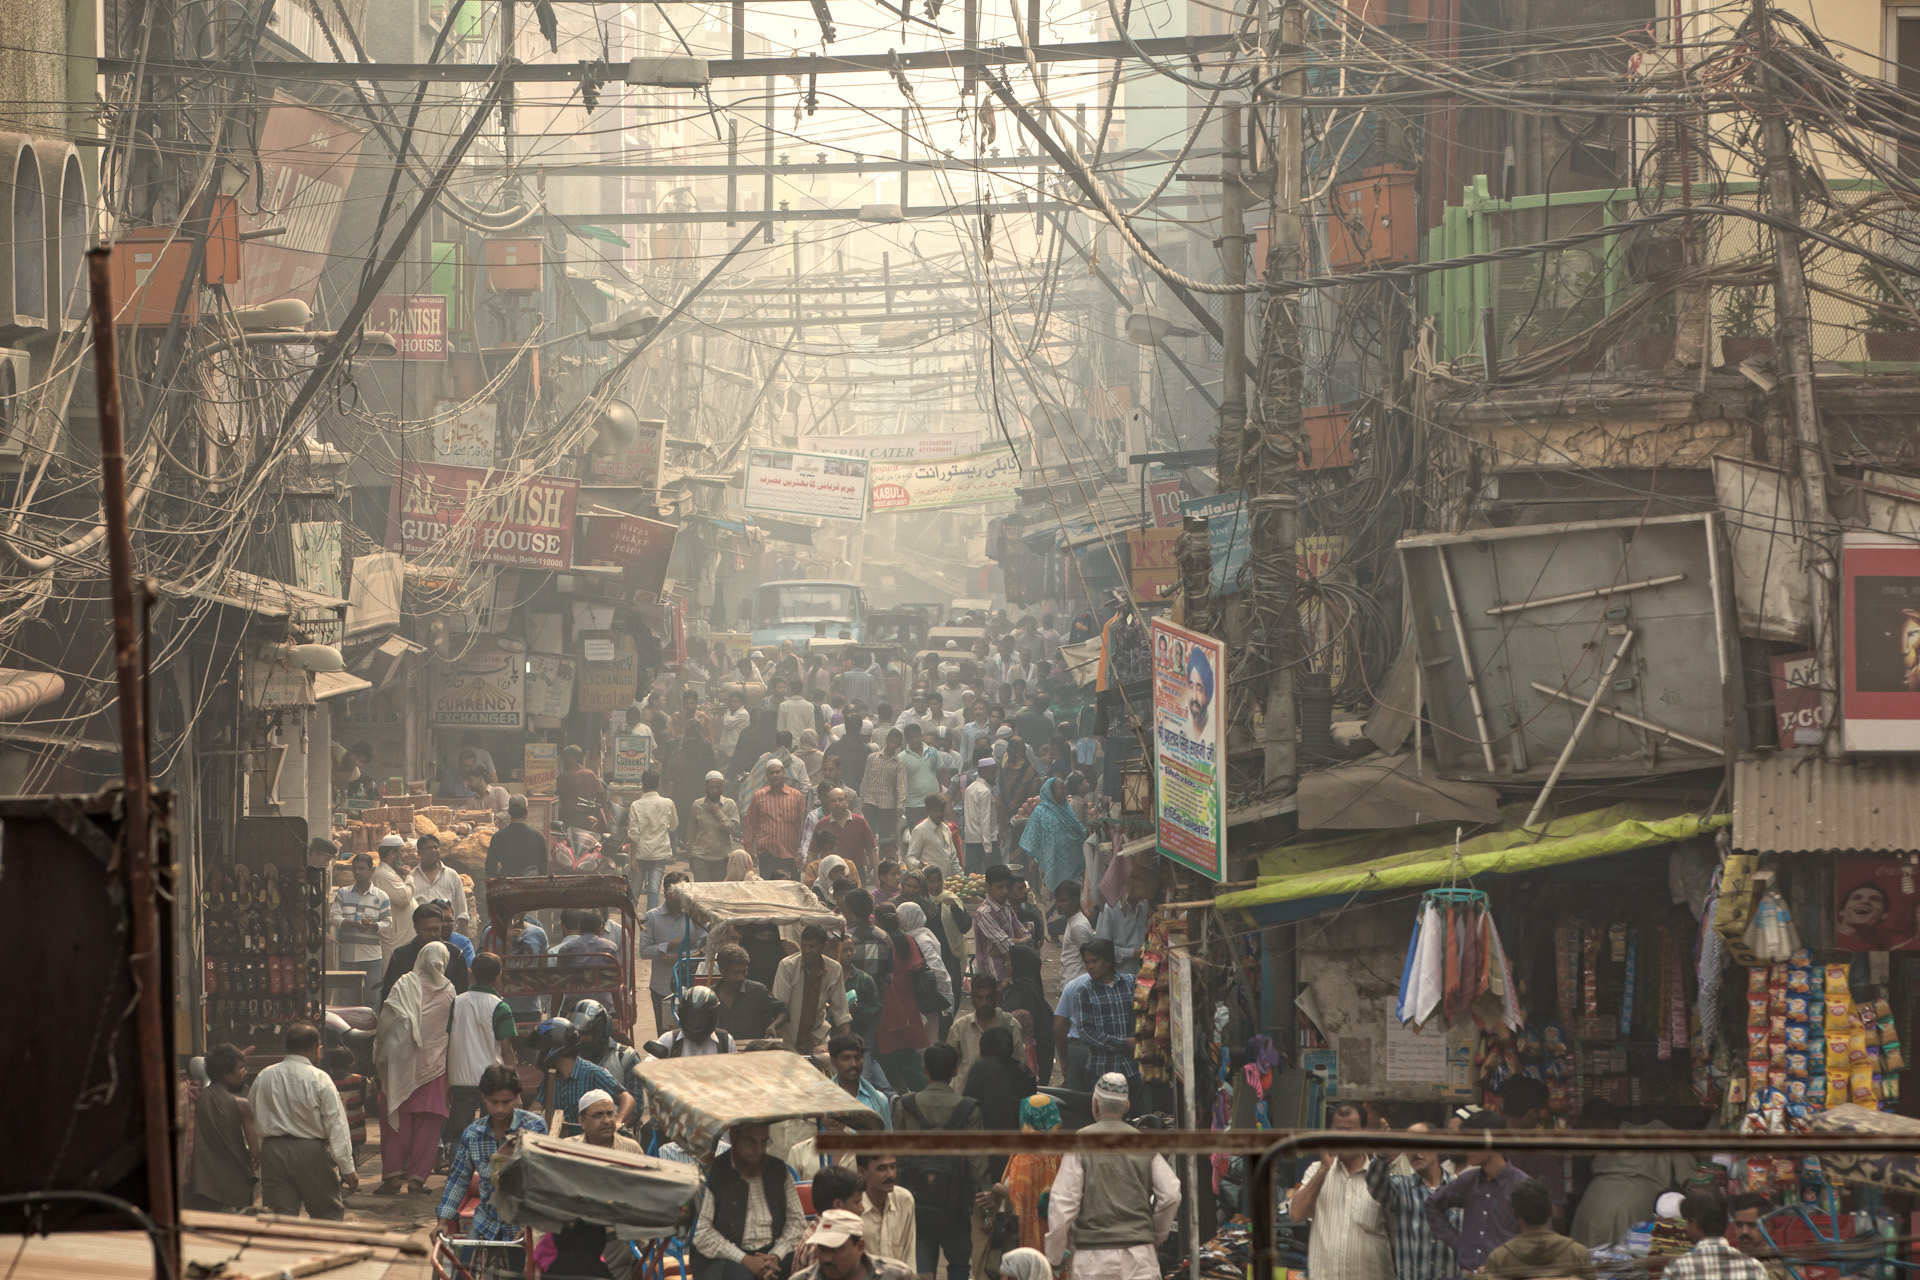 India-Travel-Old-Delhi-Street-1.JPG